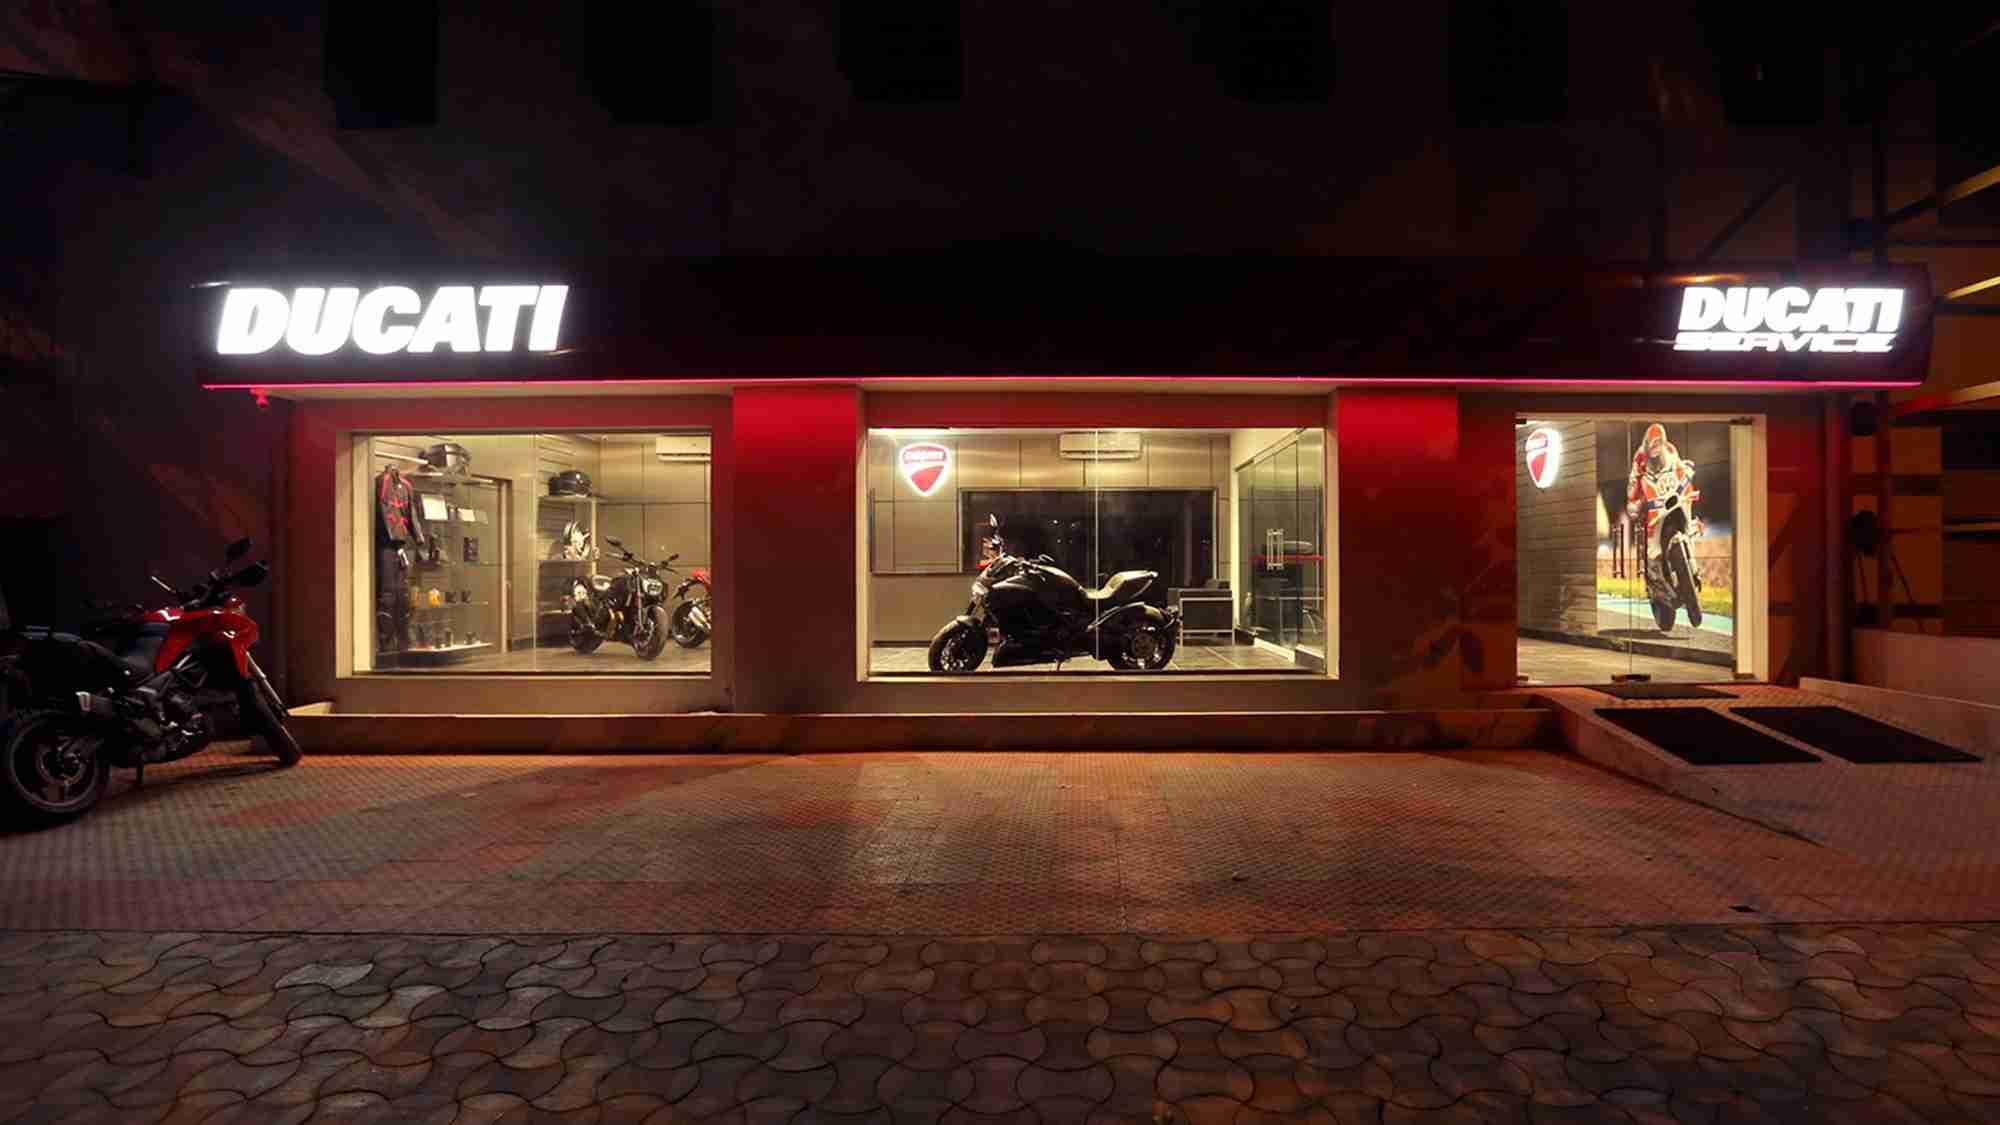 Ducati Chennai showroom